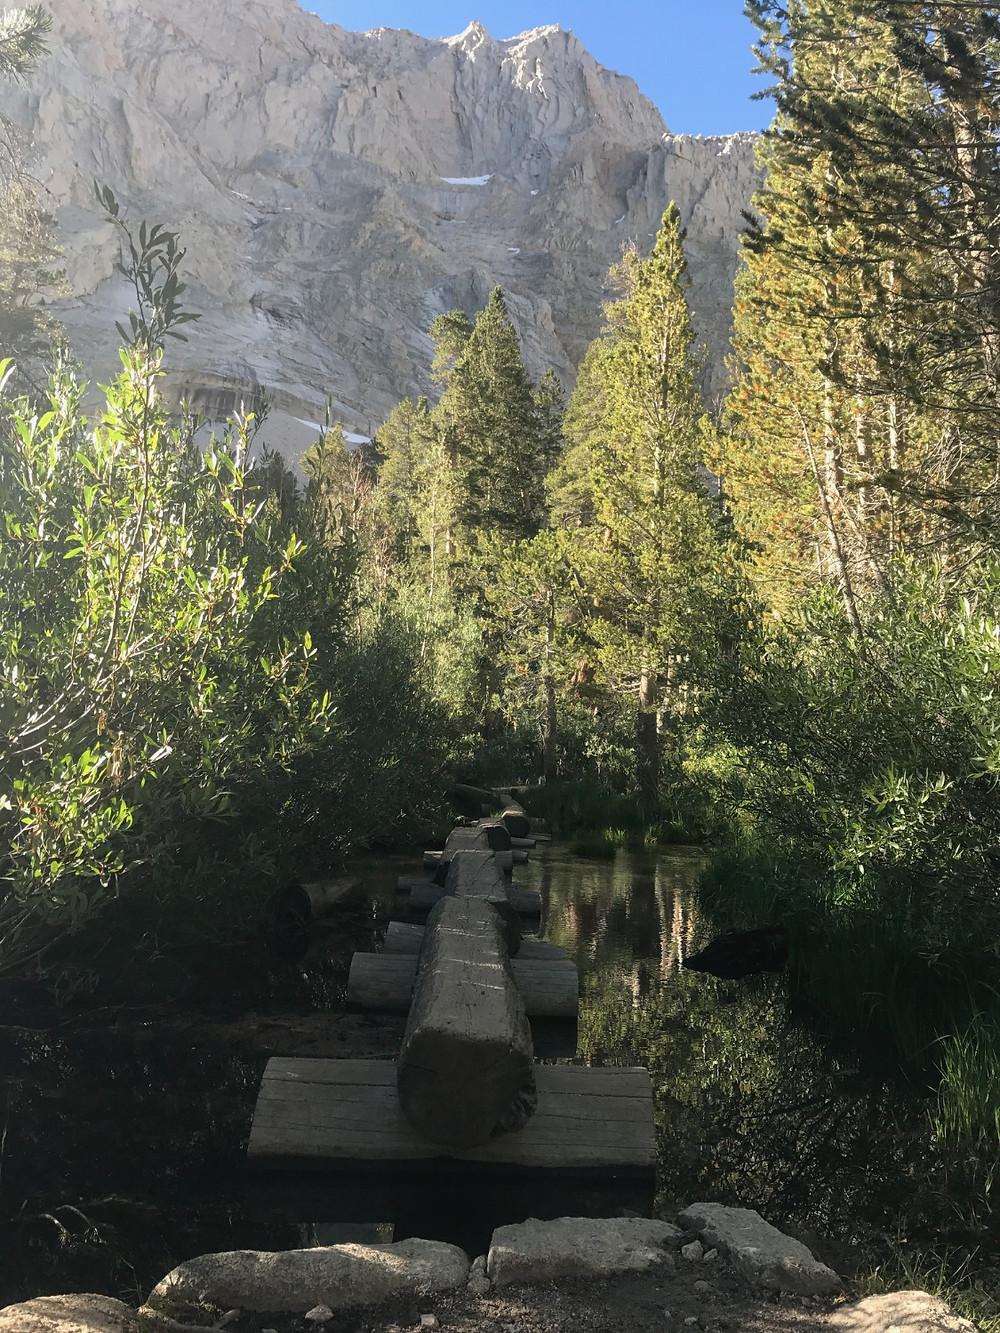 Mt Whitney trail creek crossing